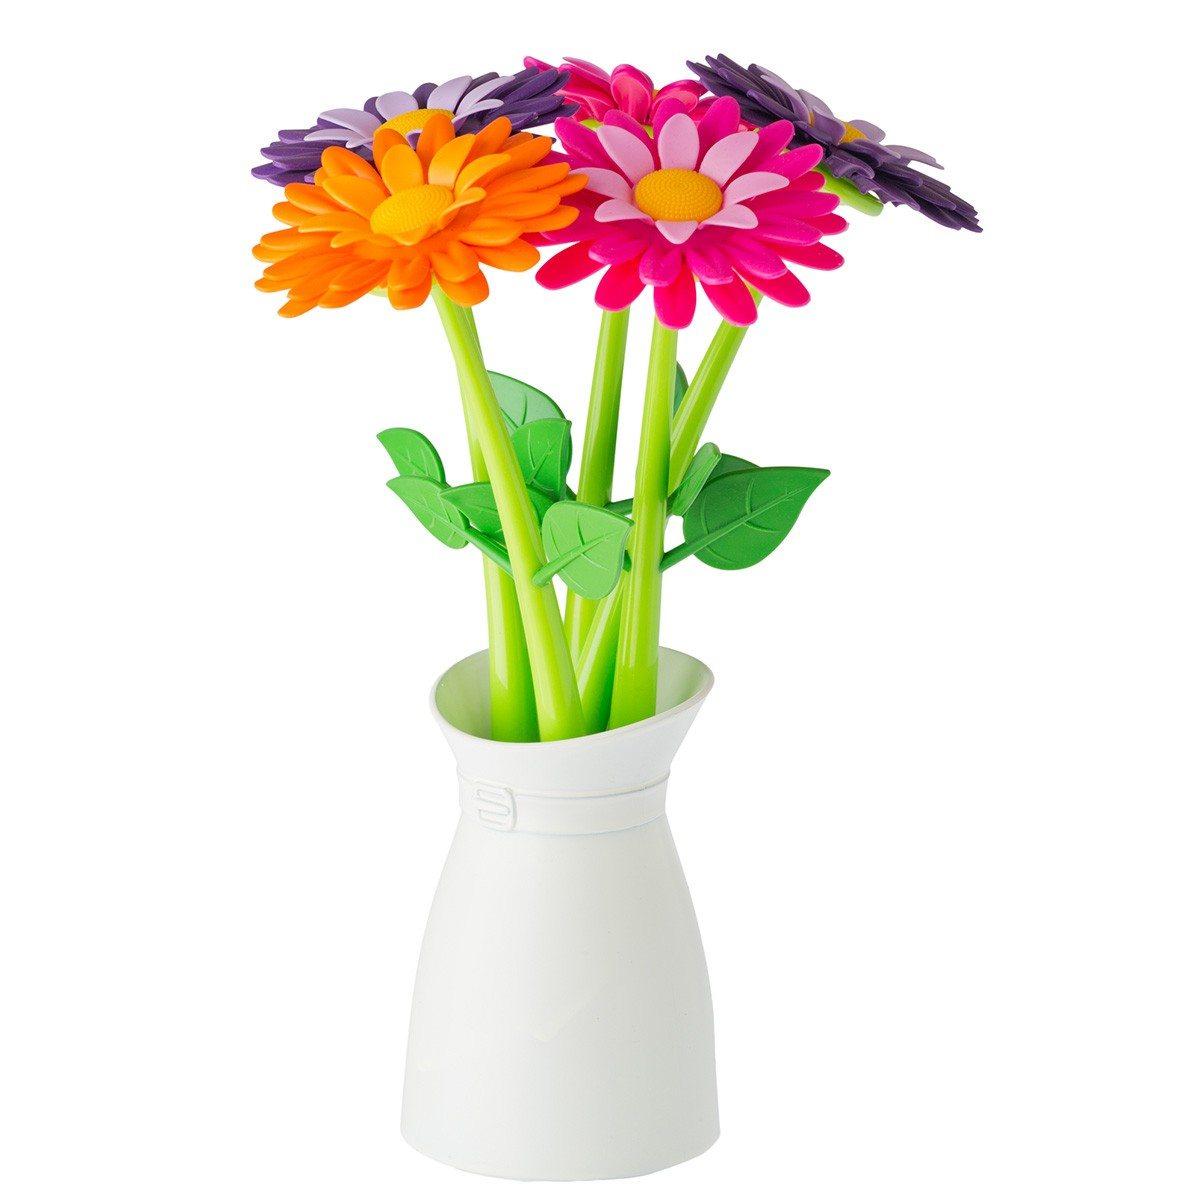 """It's springtime!"" - Kugelschreiber-Set"